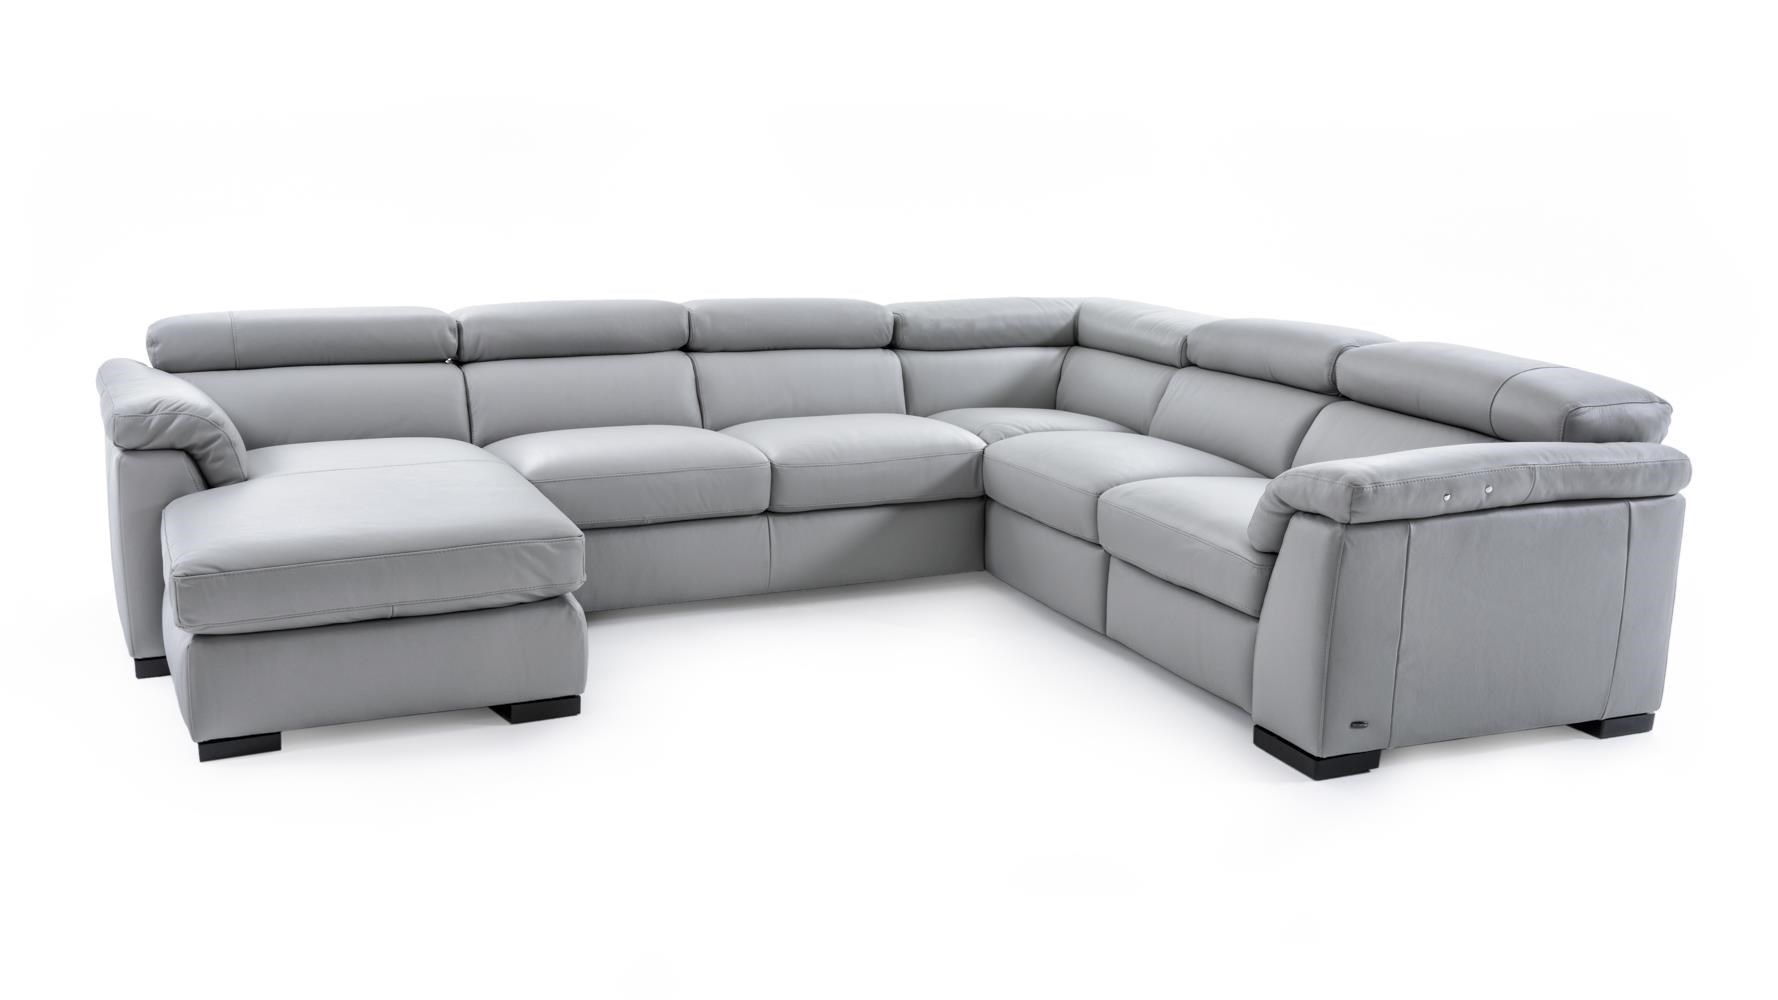 Genial Natuzzi Editions B634Sectional Sofa W/ Power Recline ...